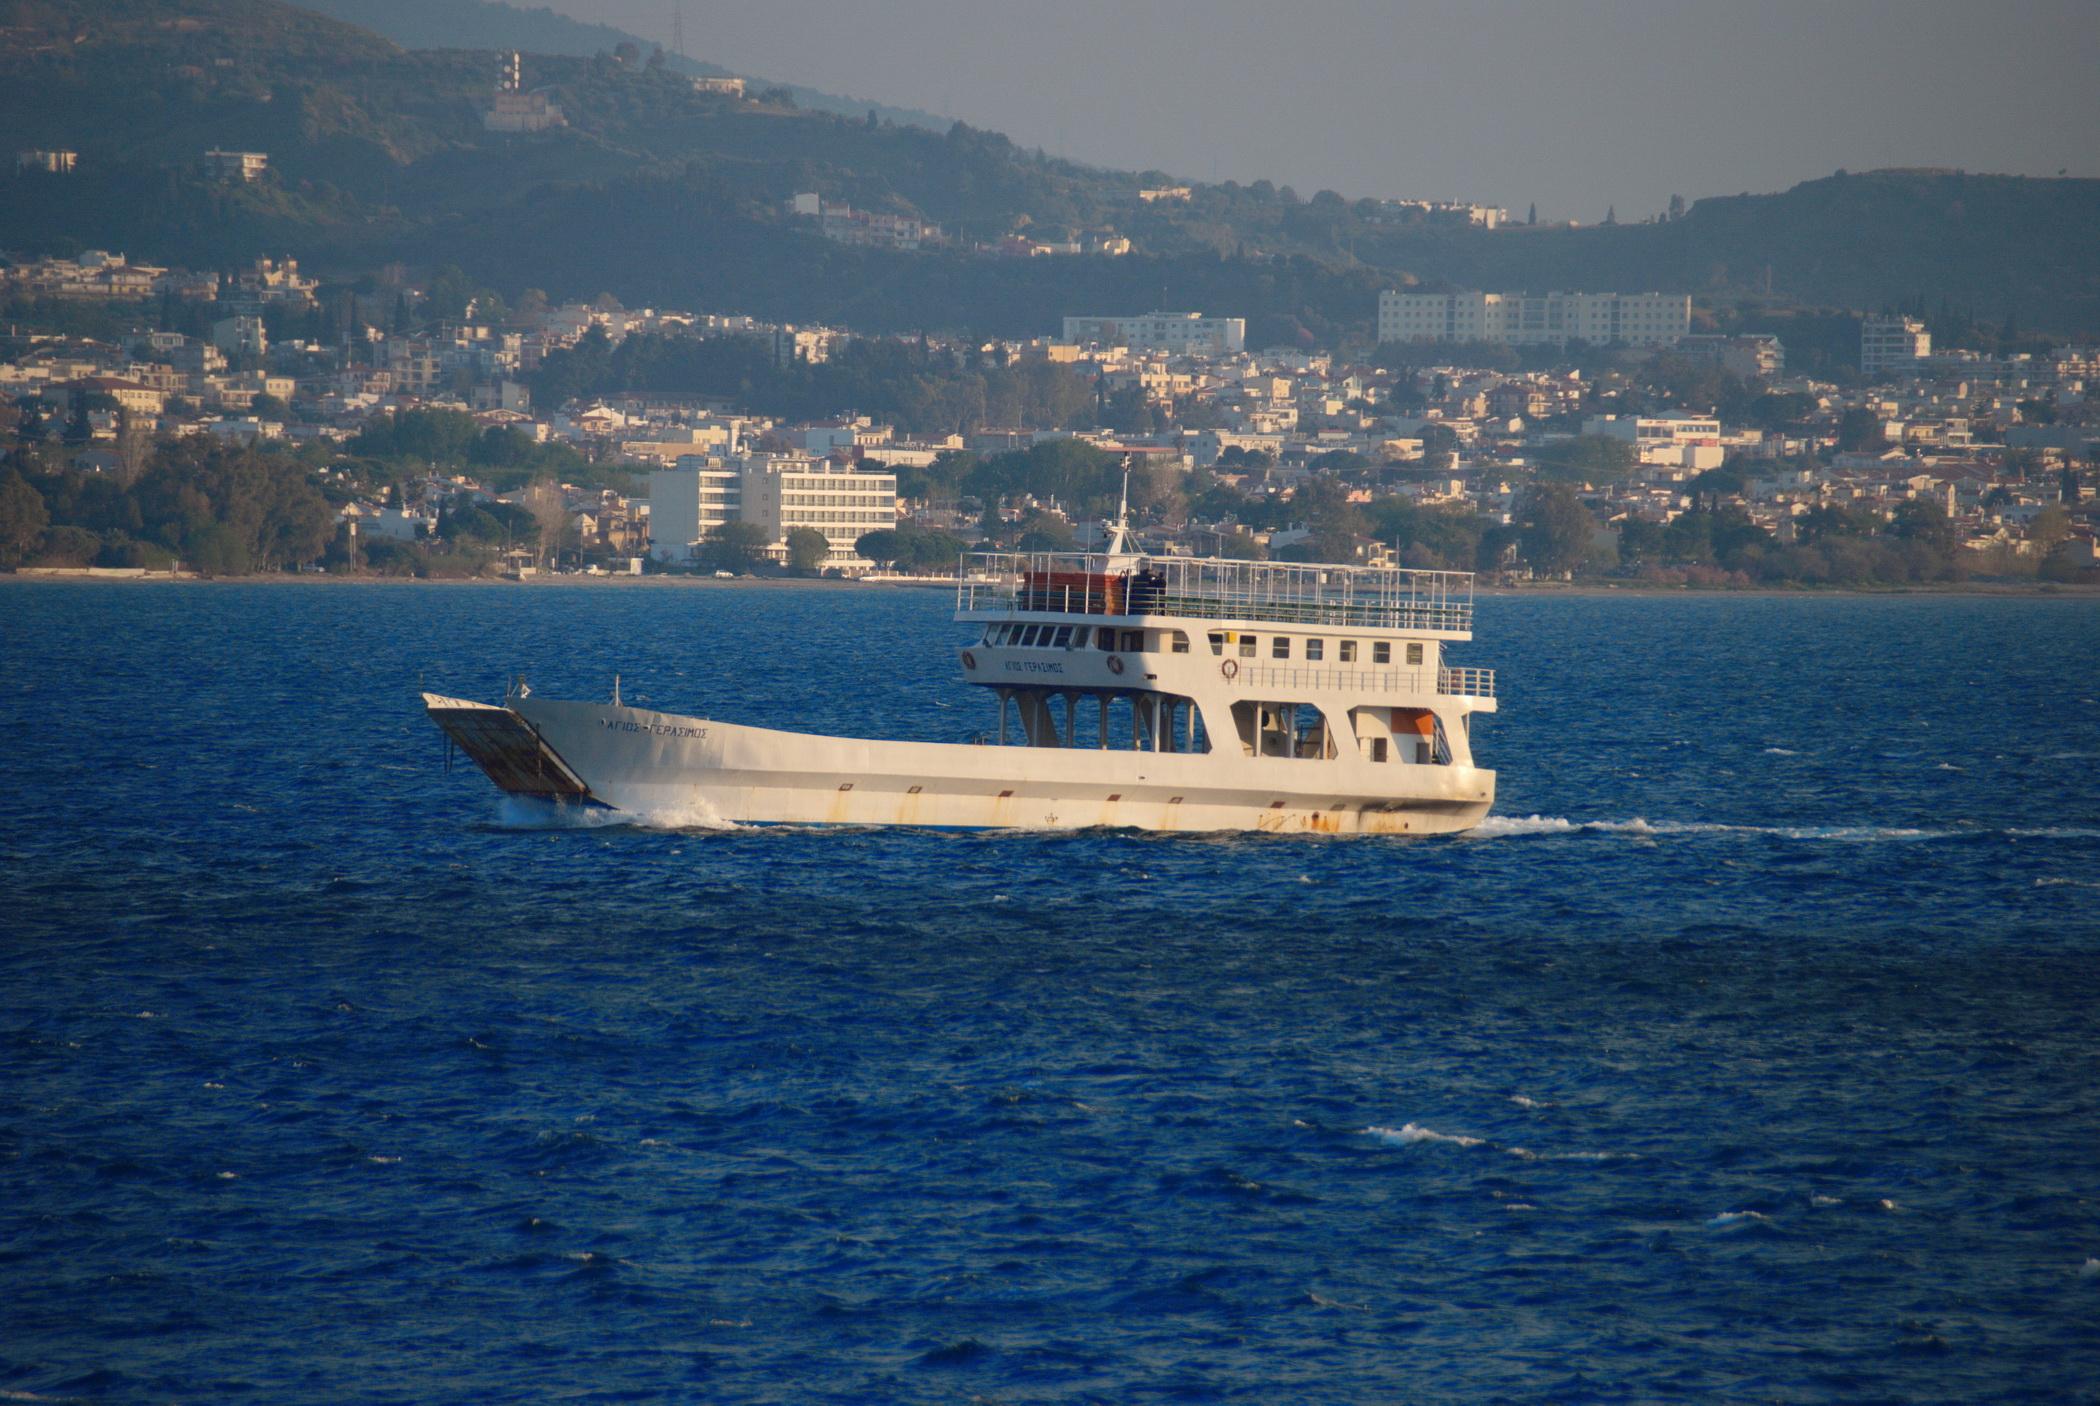 Agios Gerasimos